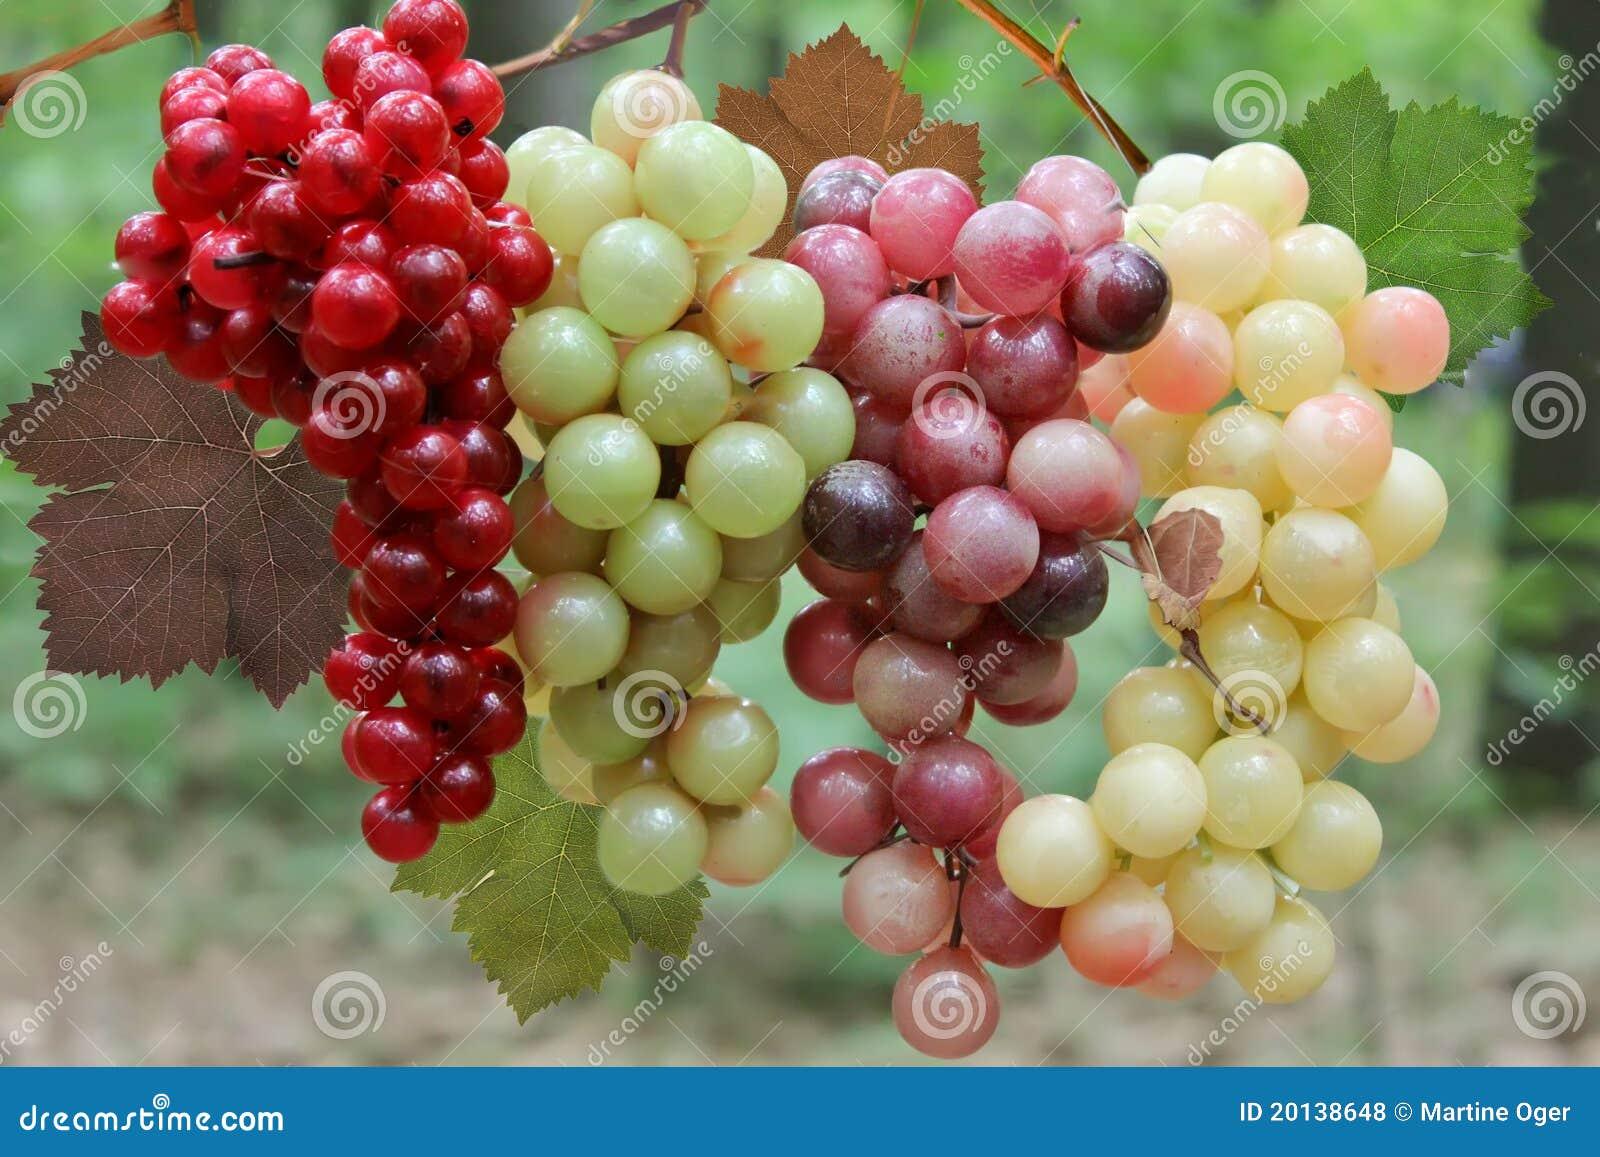 Uvas para vinho na videira.